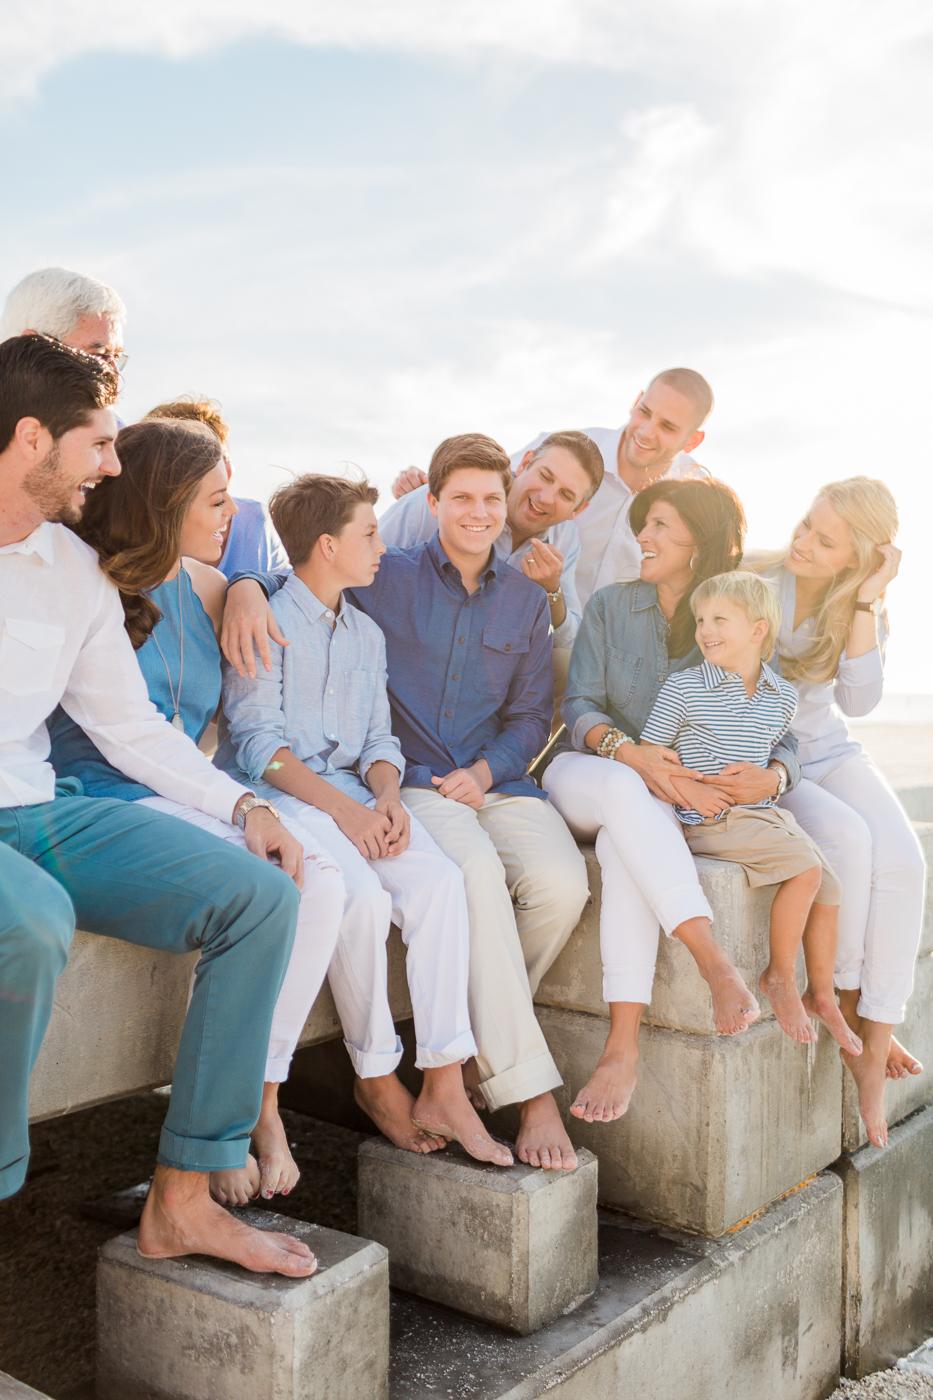 Brandenton Beach Family - bradenton, Florida